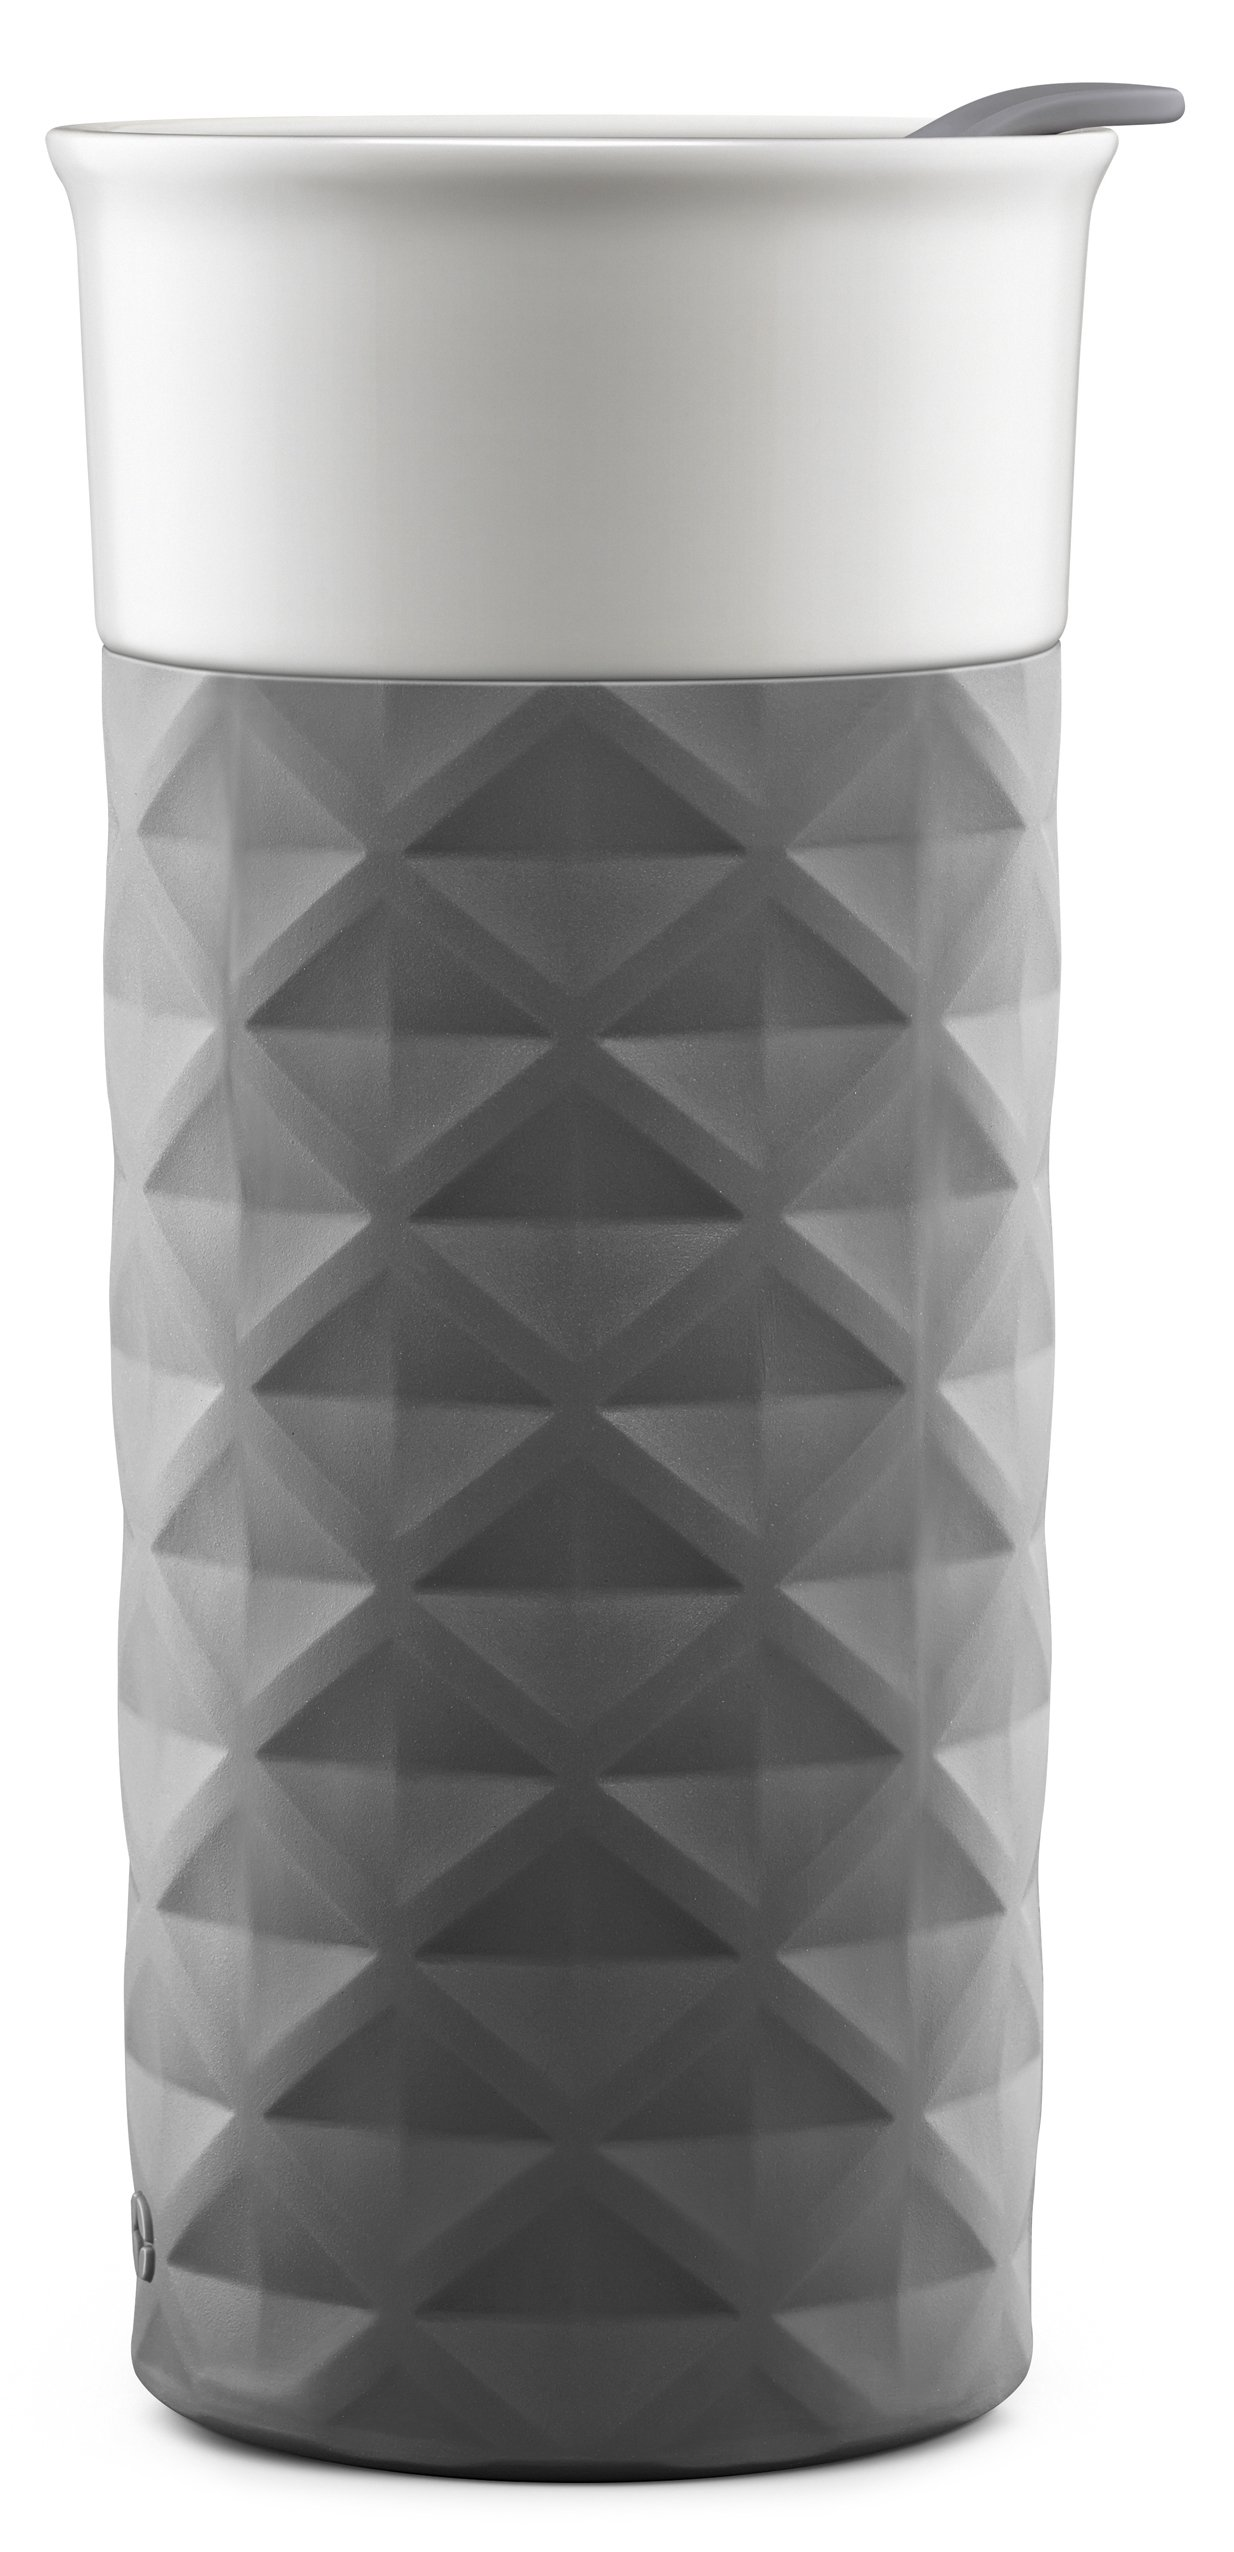 Ello Ogden BPA-Free Ceramic Travel Mug with Lid, Grey, 16 oz by Ello (Image #4)